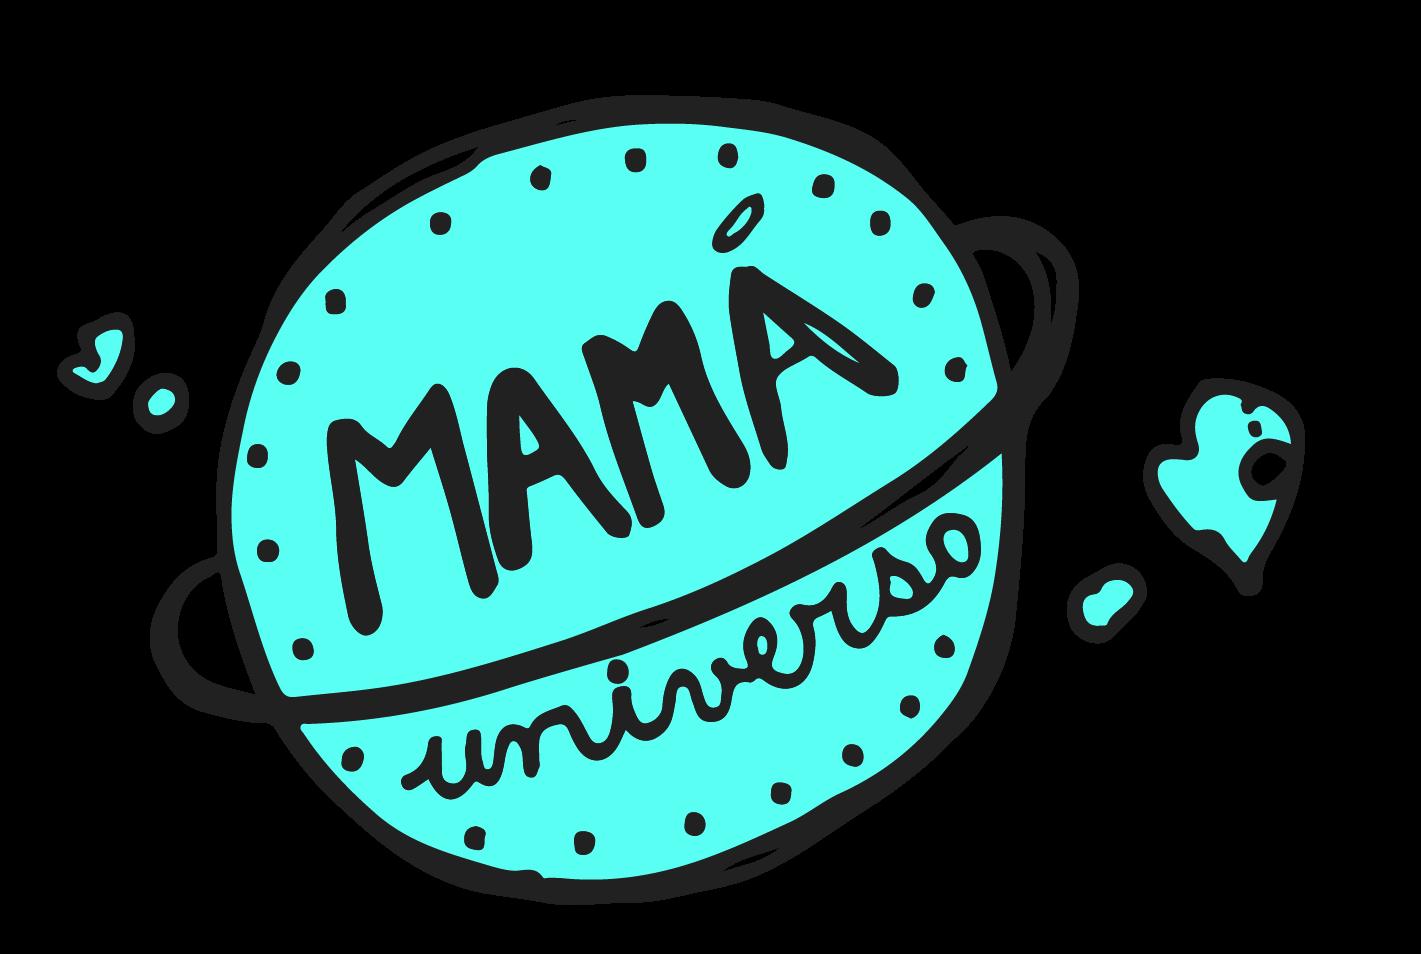 MAMÁUNIVERSOblog